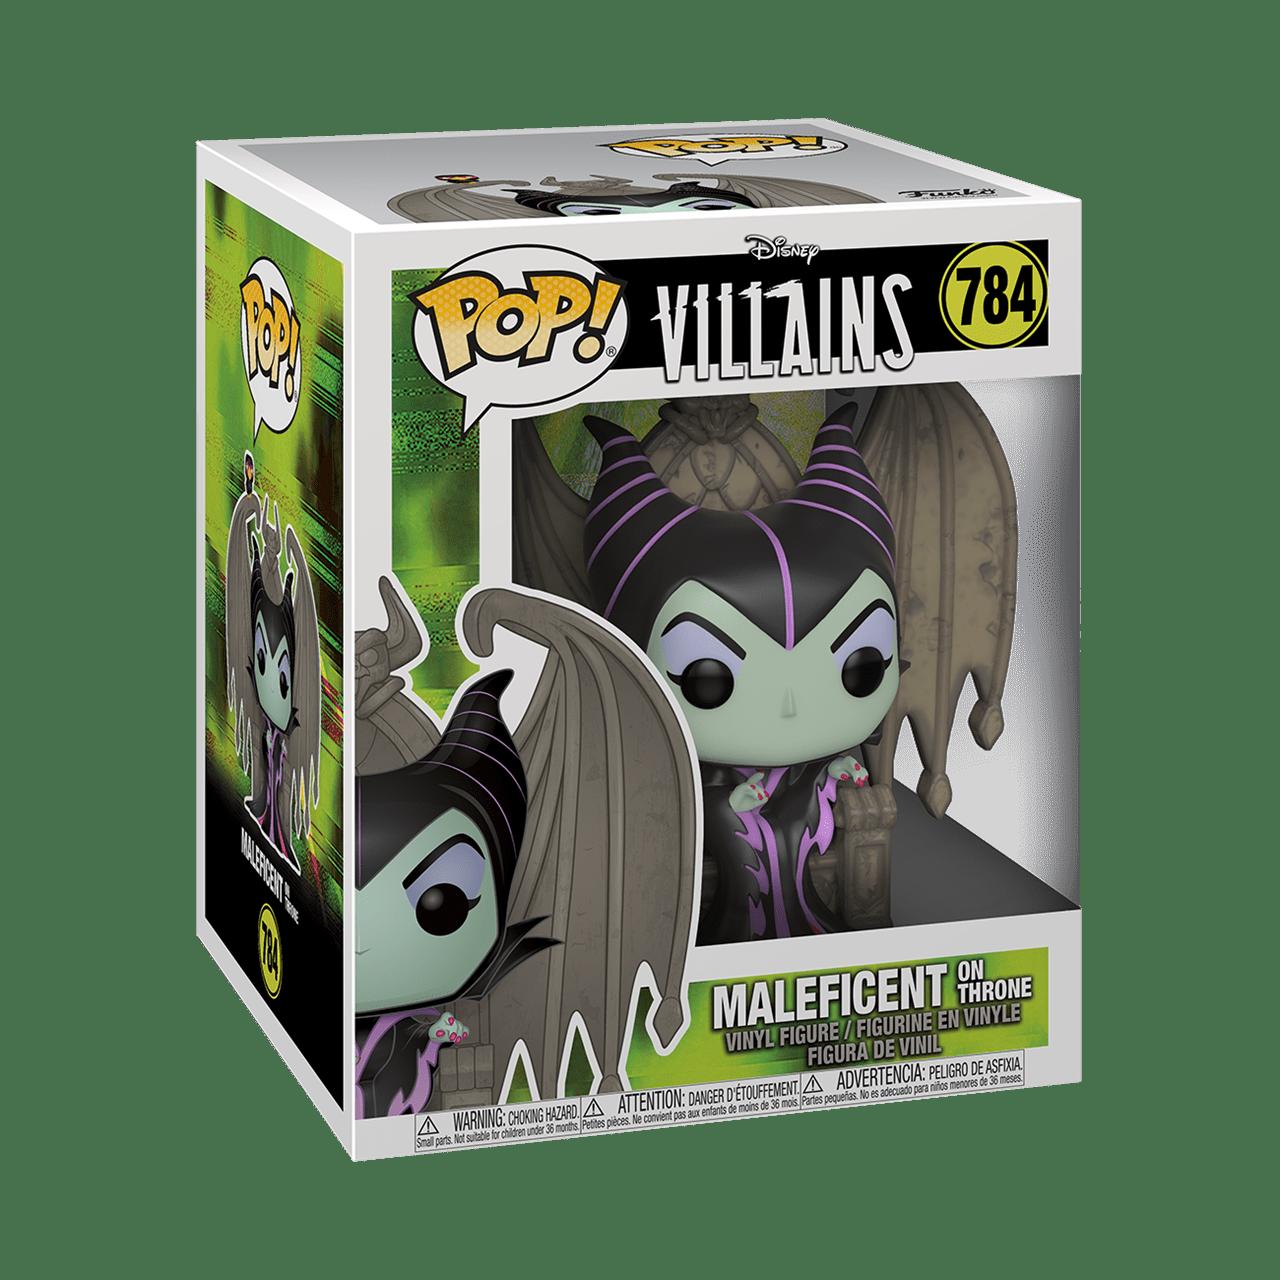 Maleficent On Throne (784) Disney Villains Pop Vinyl Deluxe - 2